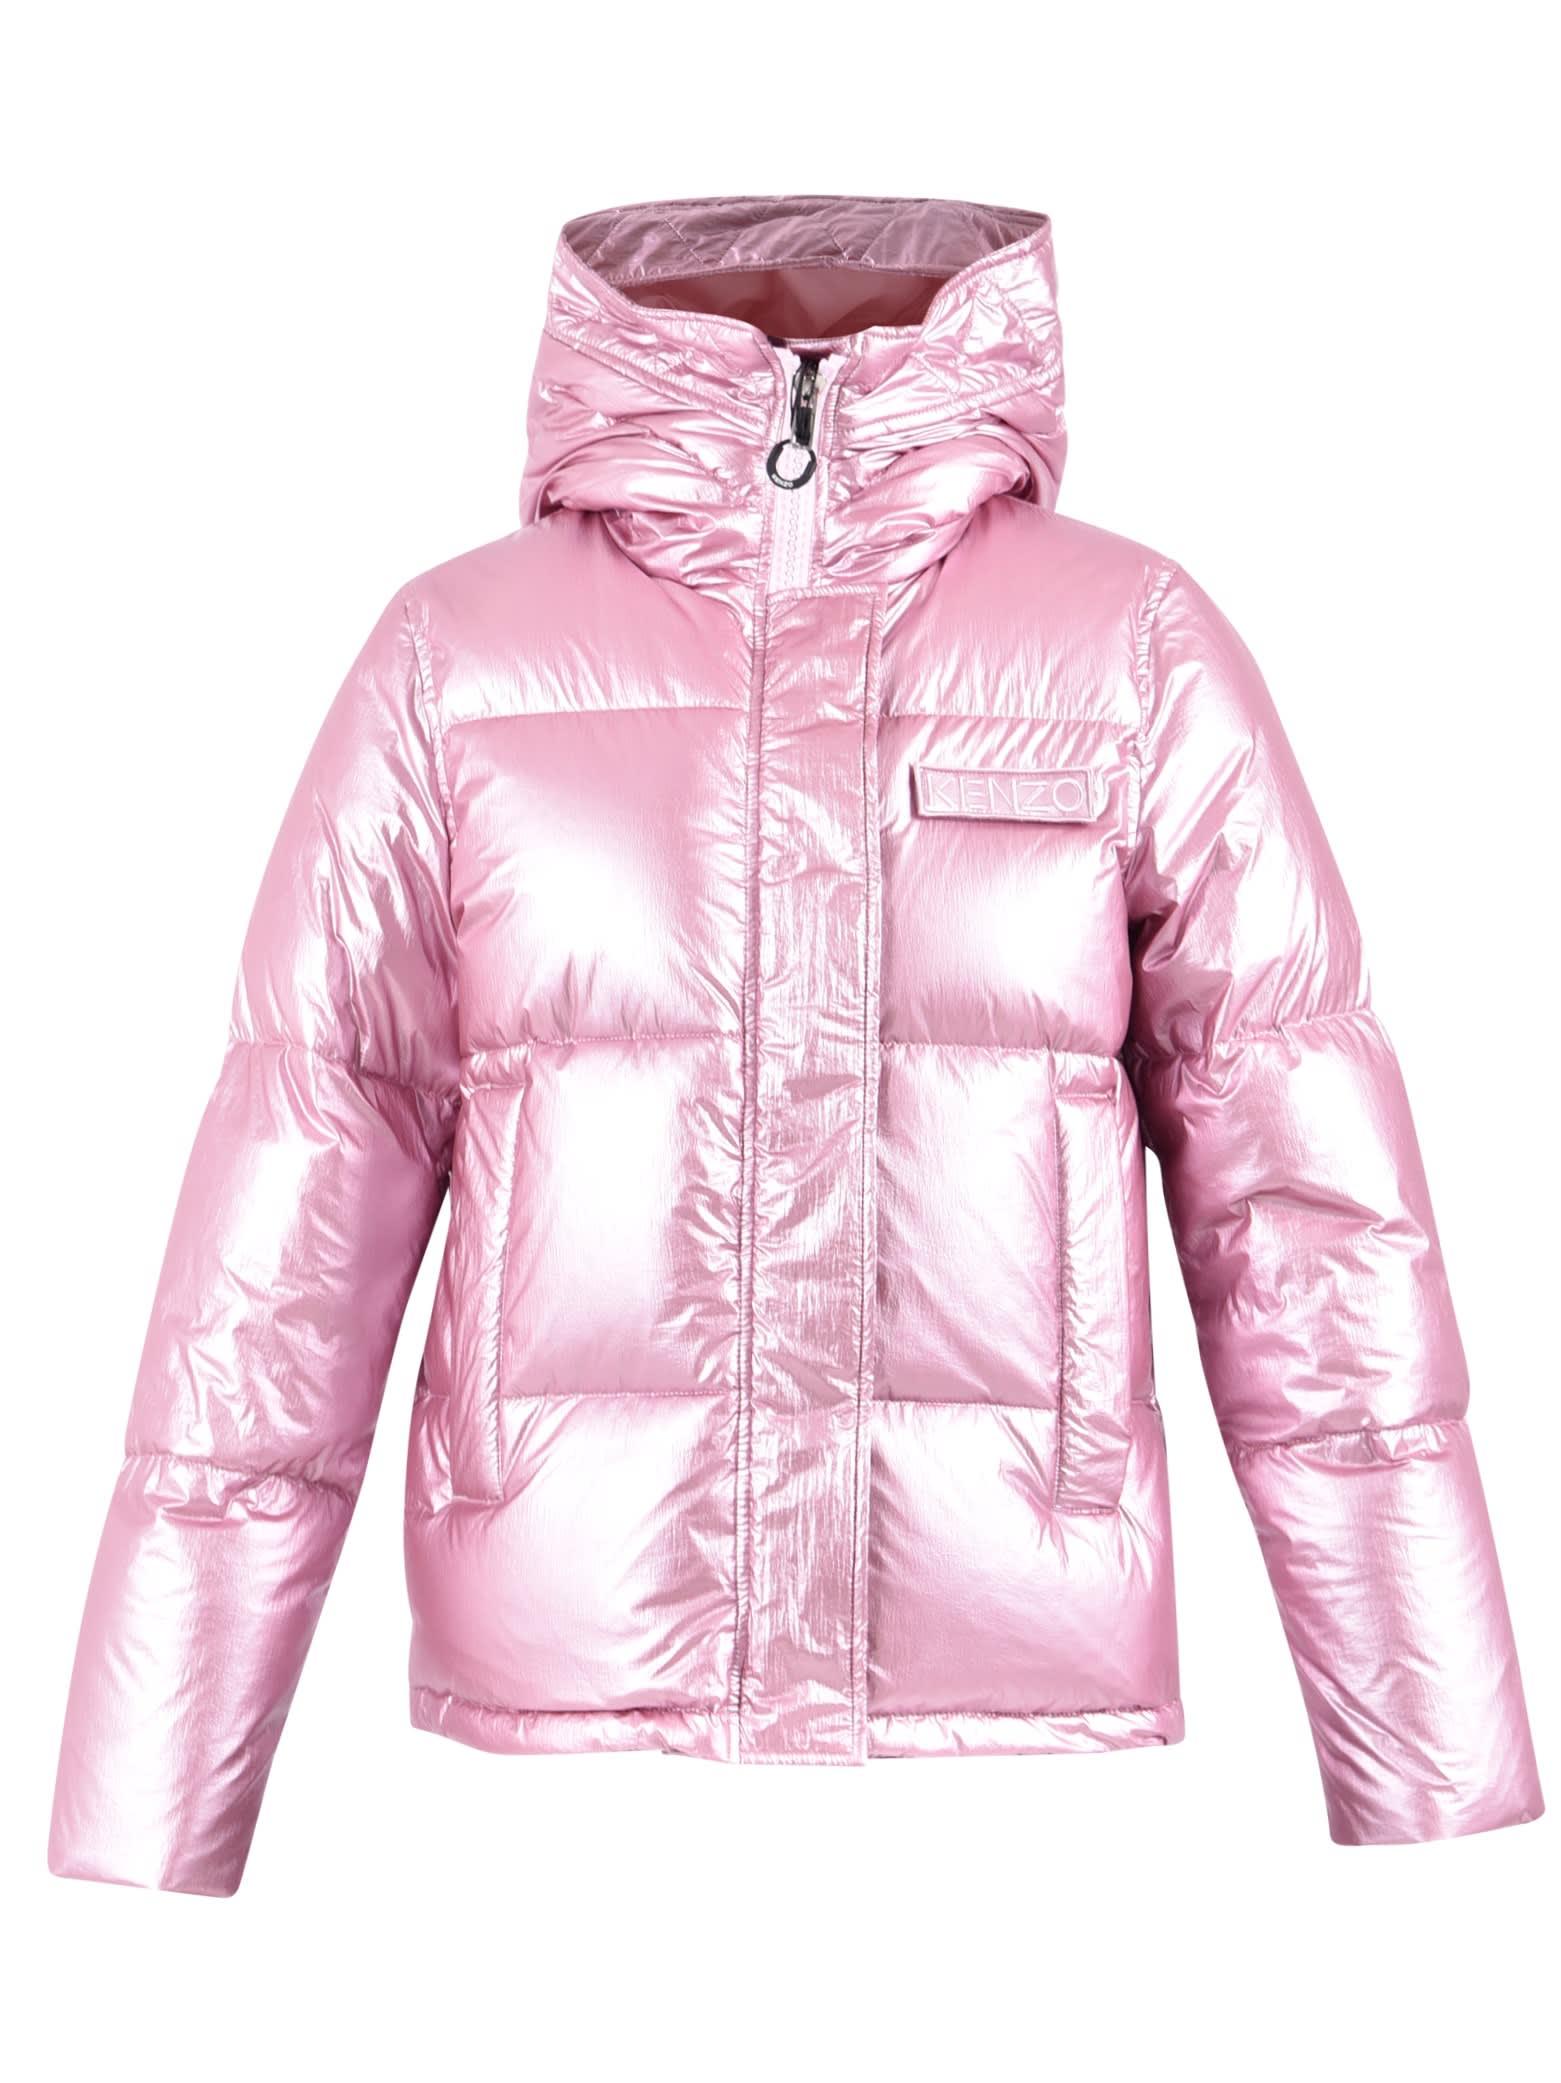 Kenzo Branded Padded Jacket